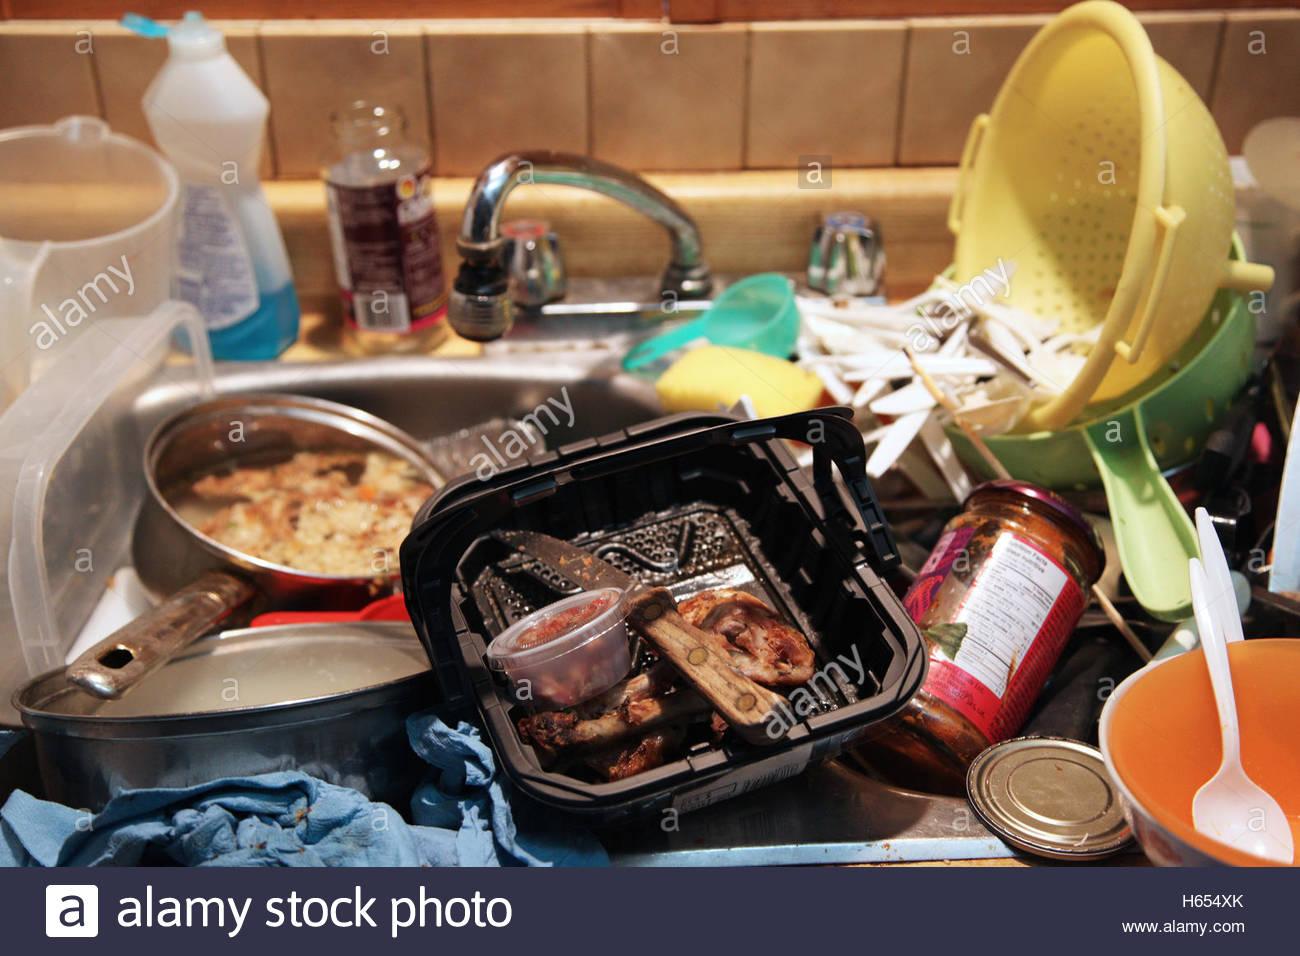 messy food kitchen sex